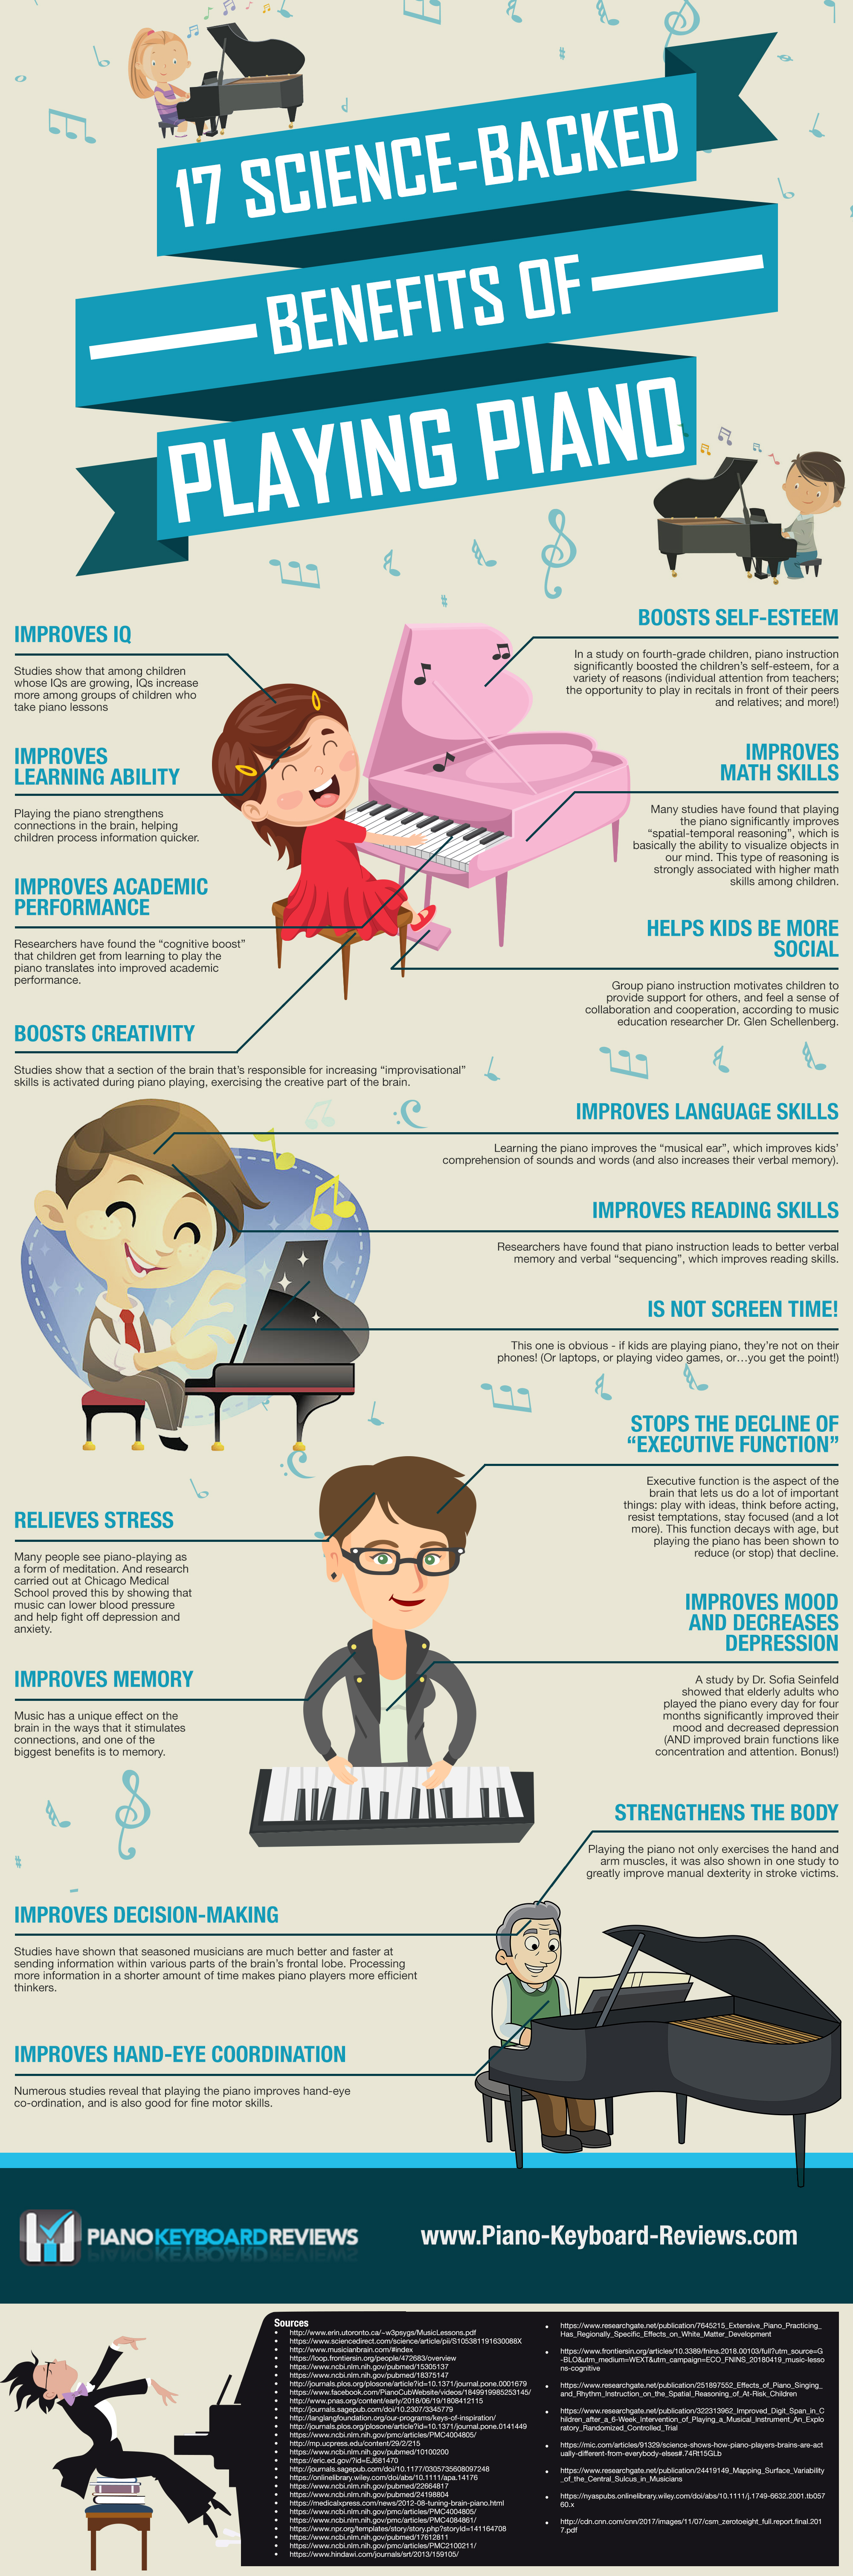 Benefits_of_playing_piano.jpg